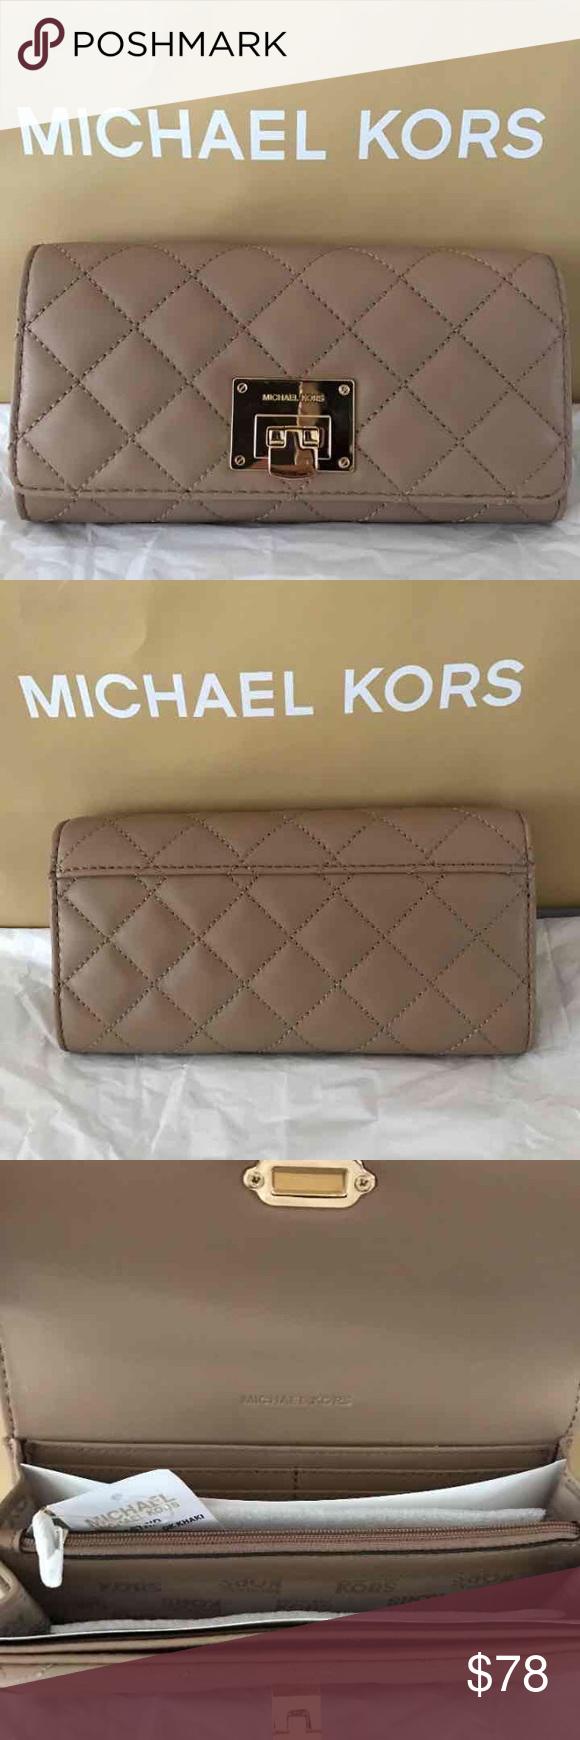 8e473e5e4a9232 Michael Kors Astrid Carryall Wallet • New with tag authentic Michael Kors  astrid carryall wallet in dark khaki. • Gold tone hardware.